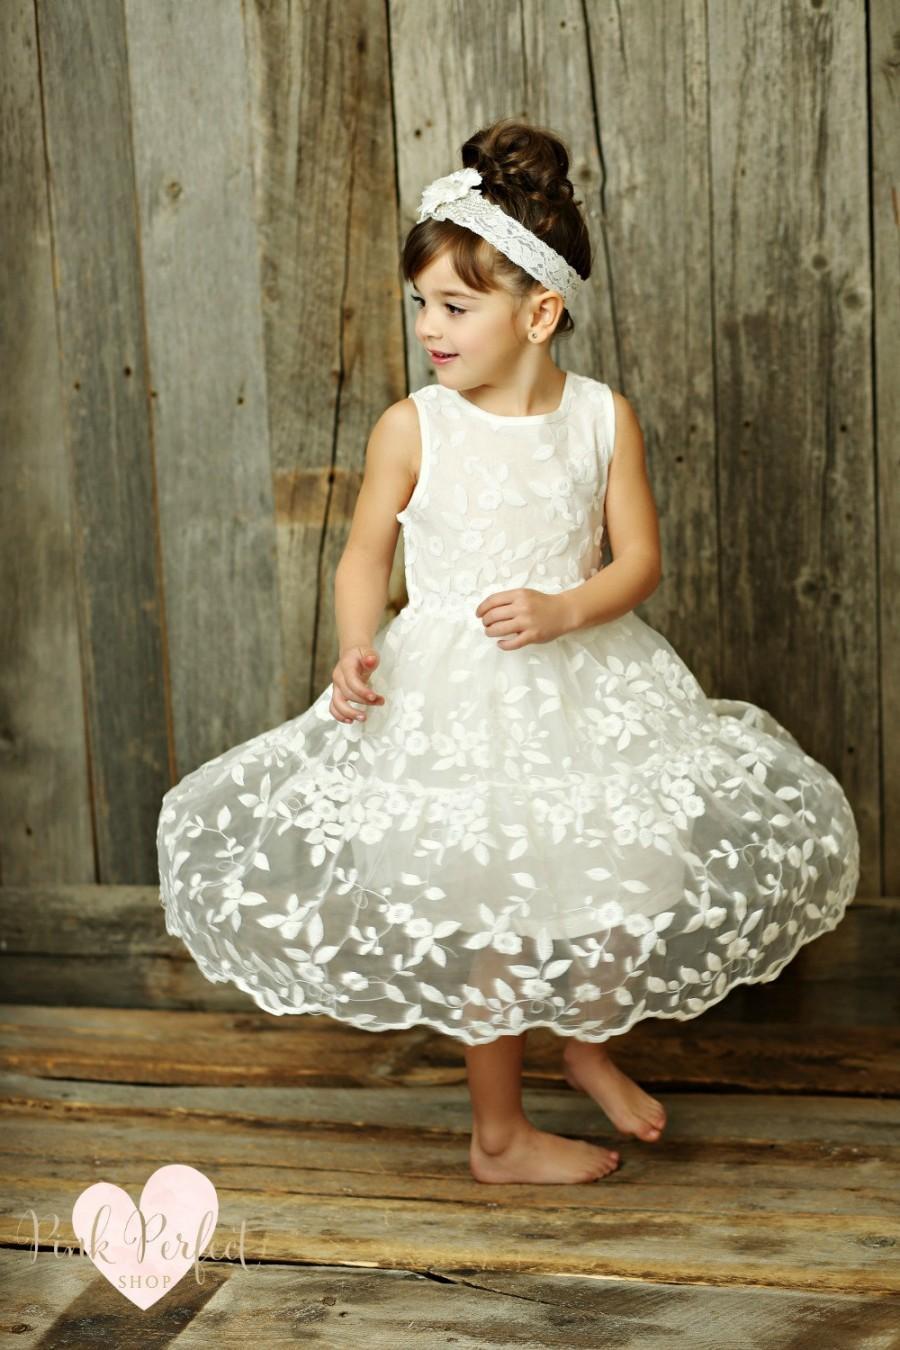 زفاف - Flower Girl dress,girls lace dress,lace flower girl dress, Champagne lace dress, rustic flower girl dress,Country flower girl dress.